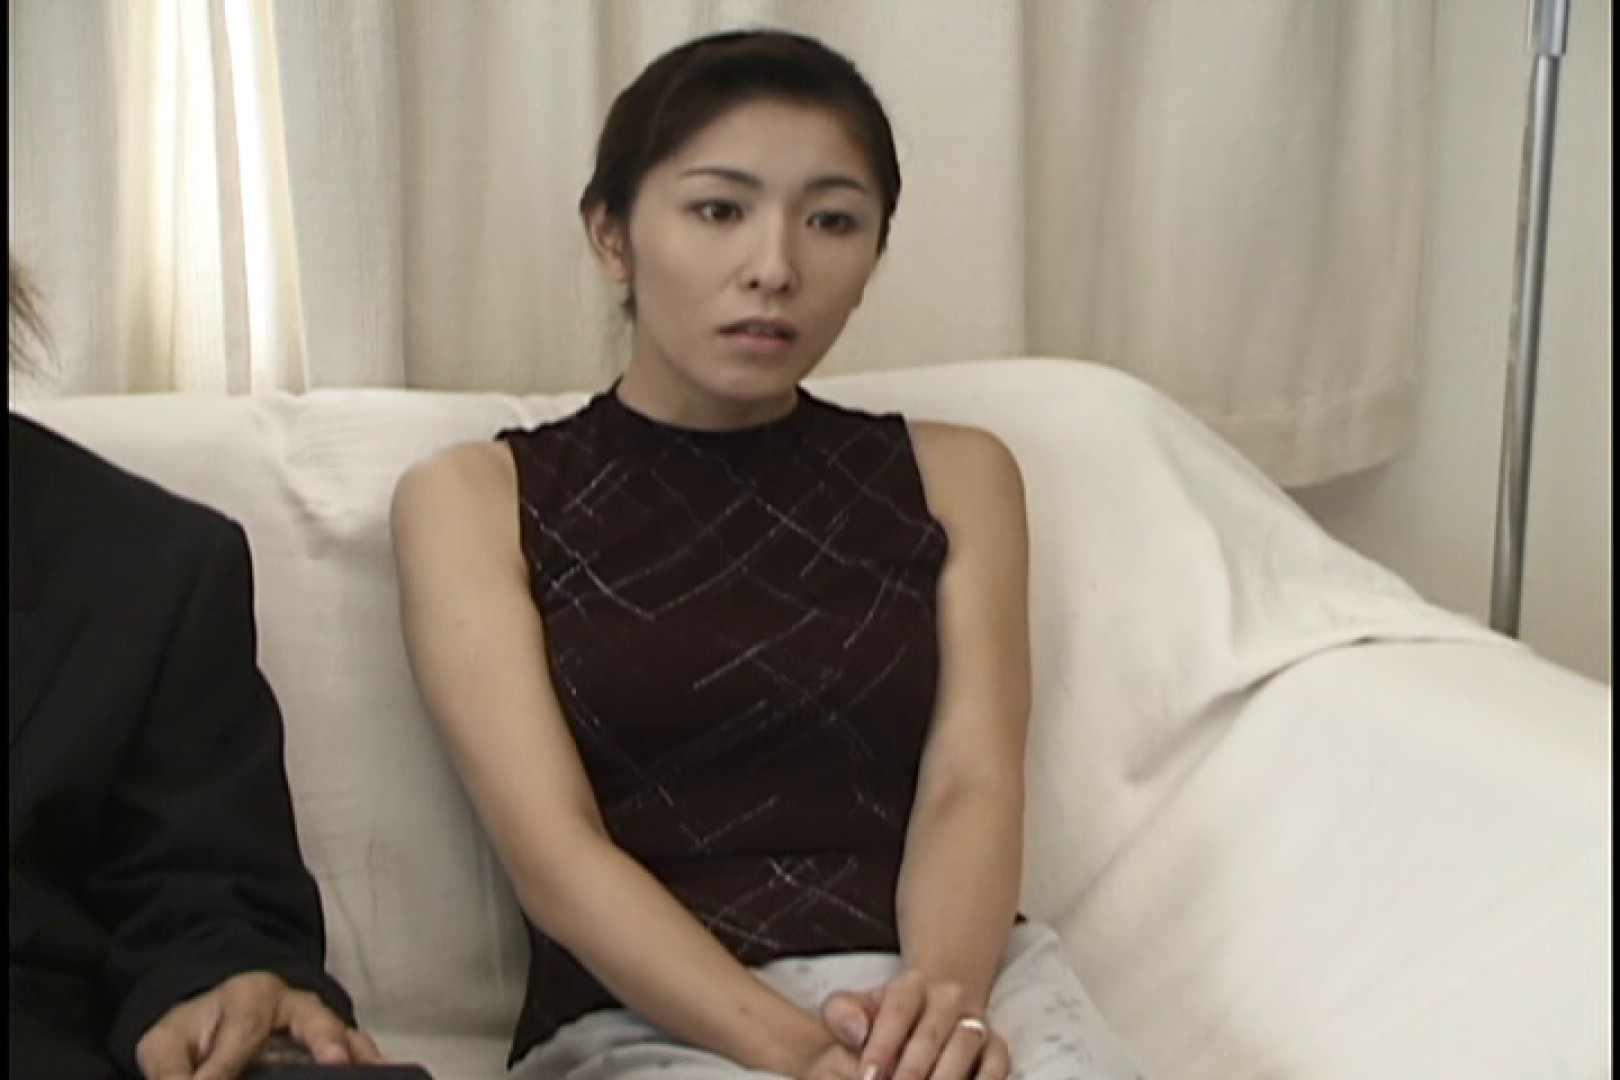 昼間の奥様は欲求不満 ~安田弘美~ 人妻  35連発 6